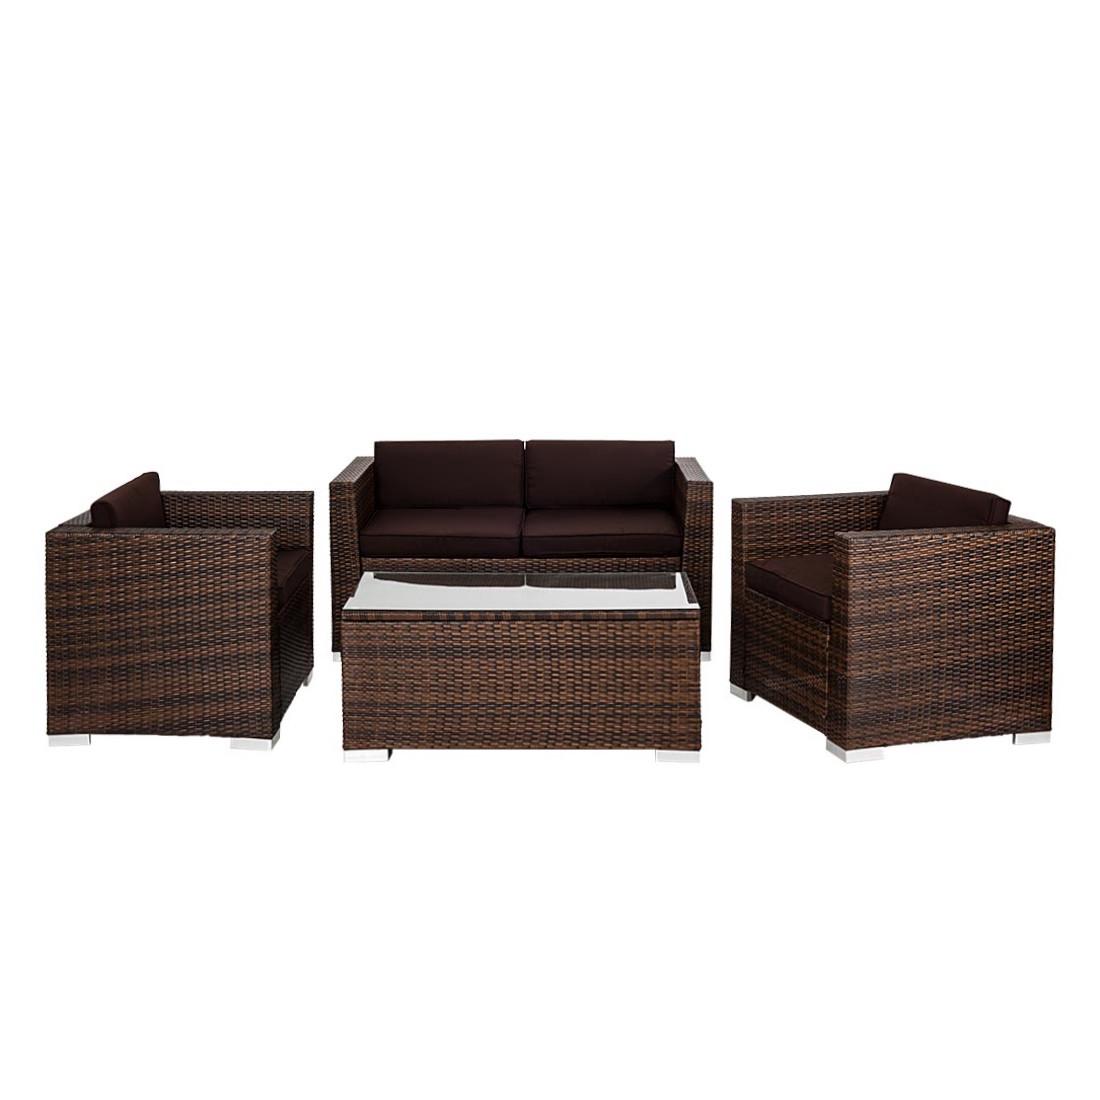 Loungegruppe Bari - Polyrattan Braun, Merxx